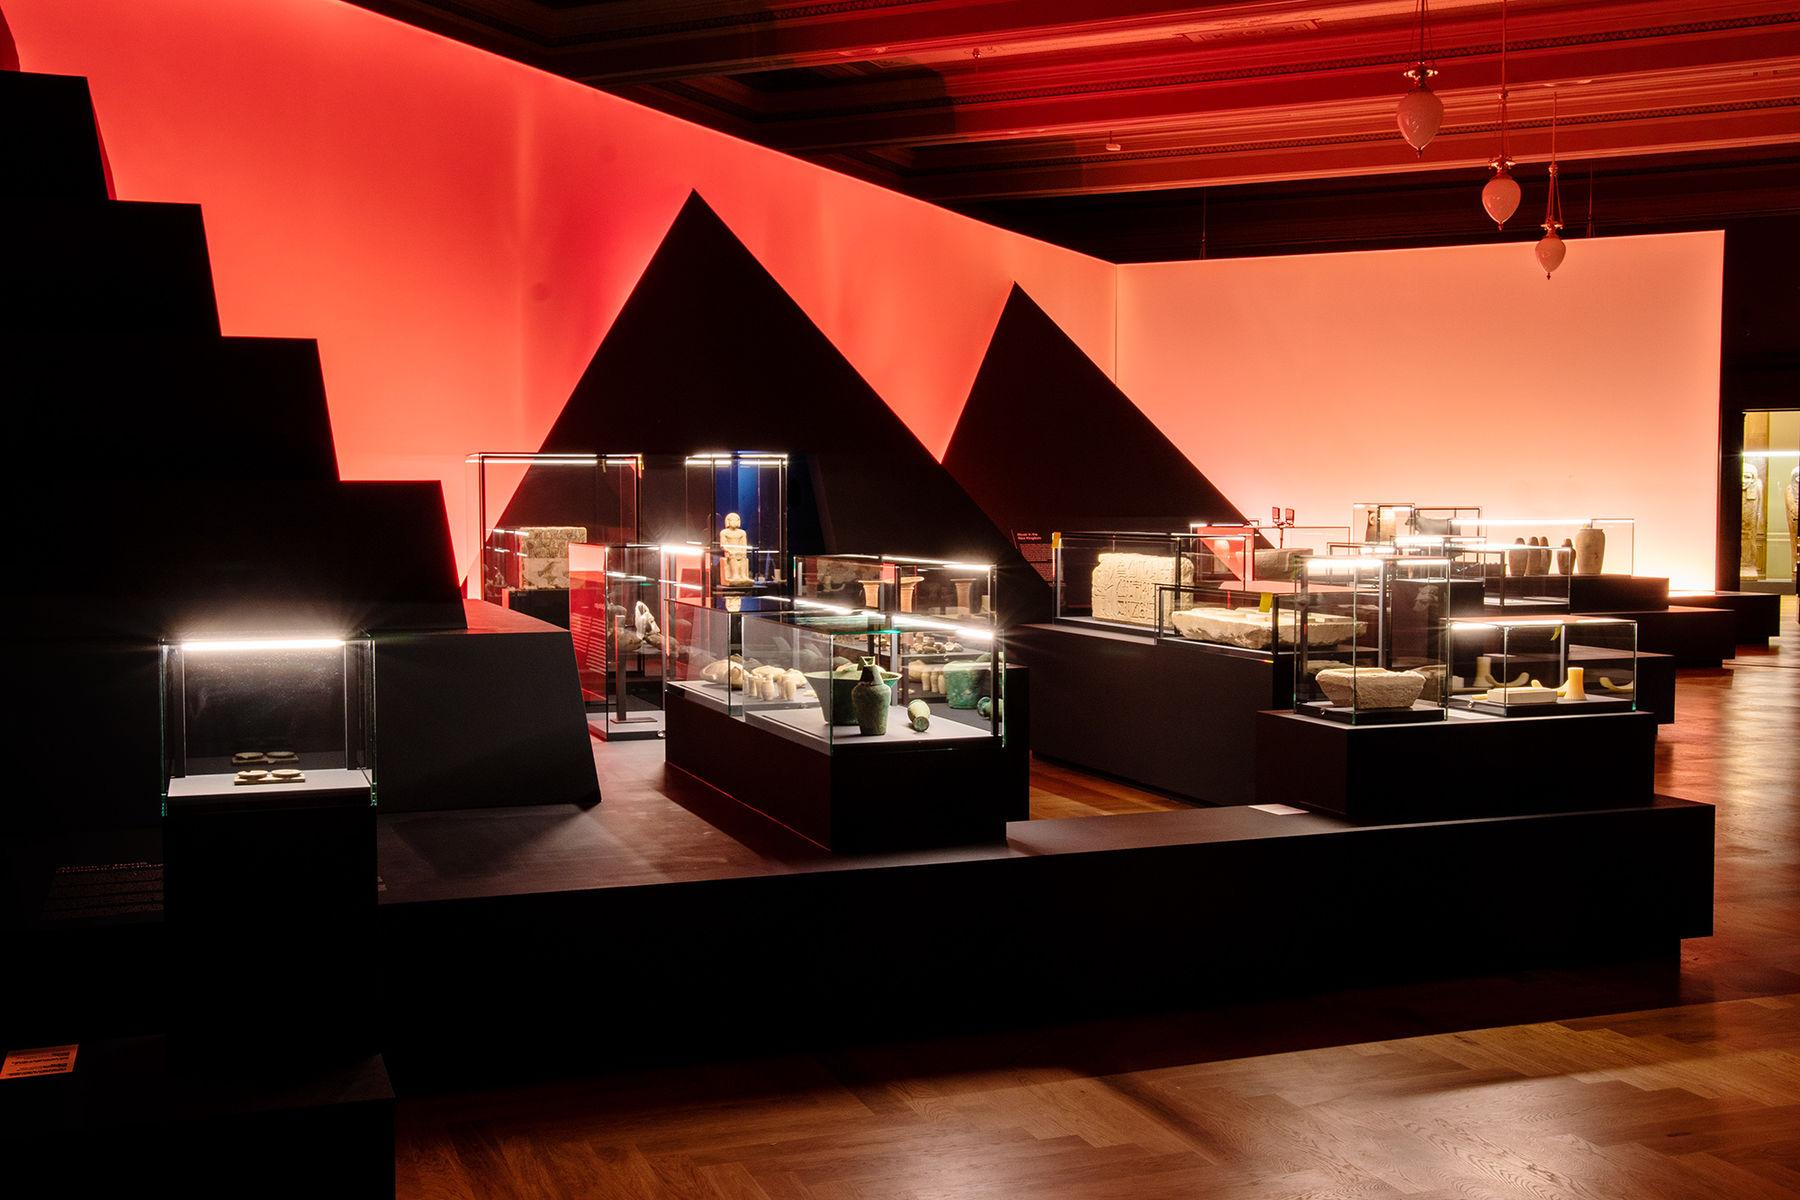 Expozice Slunecni kralove v Narodnim muzeu v Praze